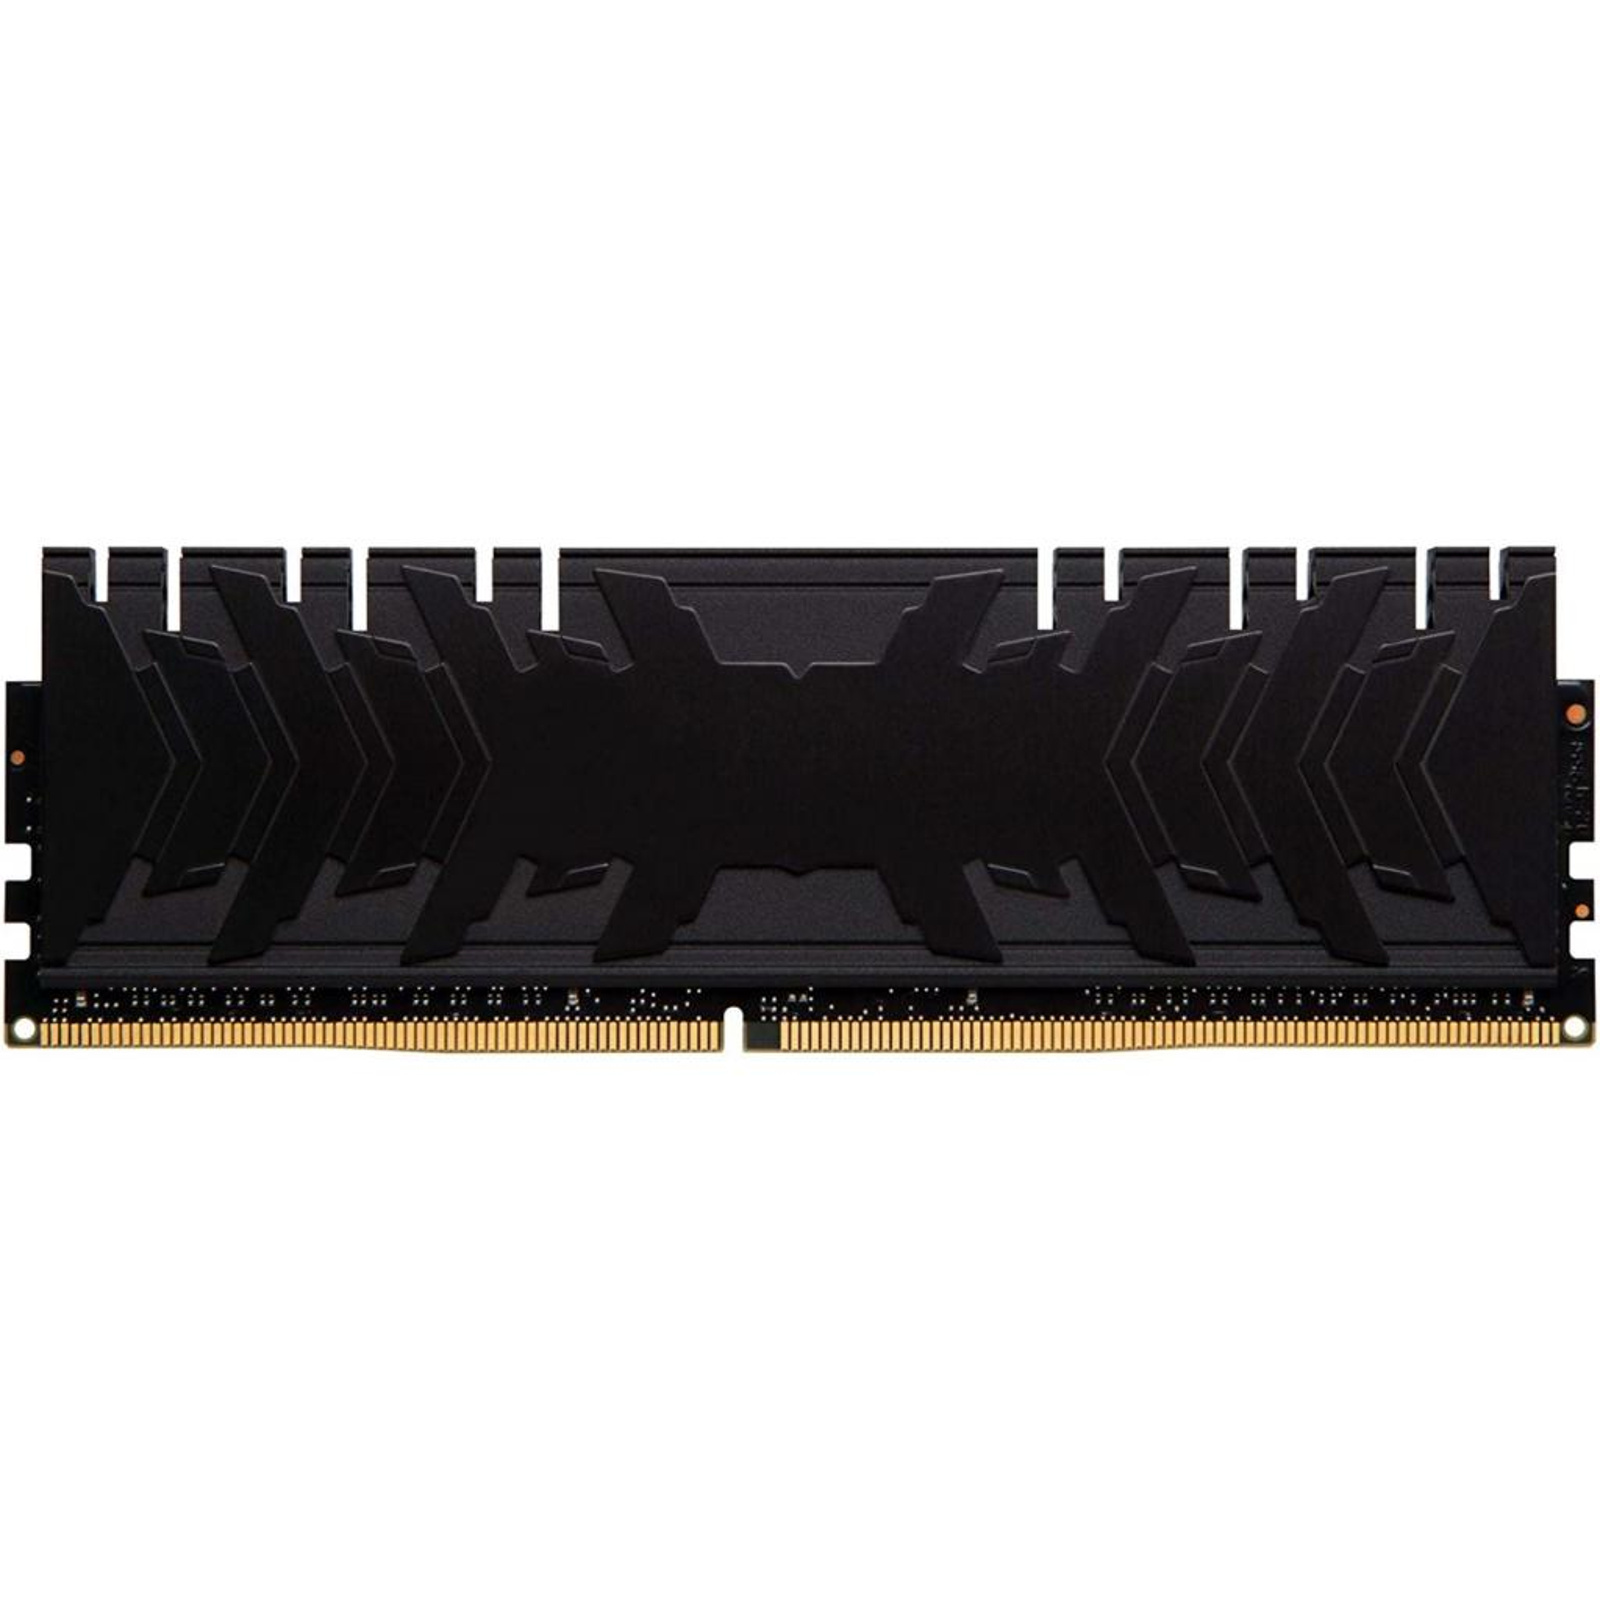 Модуль памяти для компьютера DDR4 8GB 3200 MHz HyperX Predator Black Kingston (HX432C16PB3/8) изображение 3